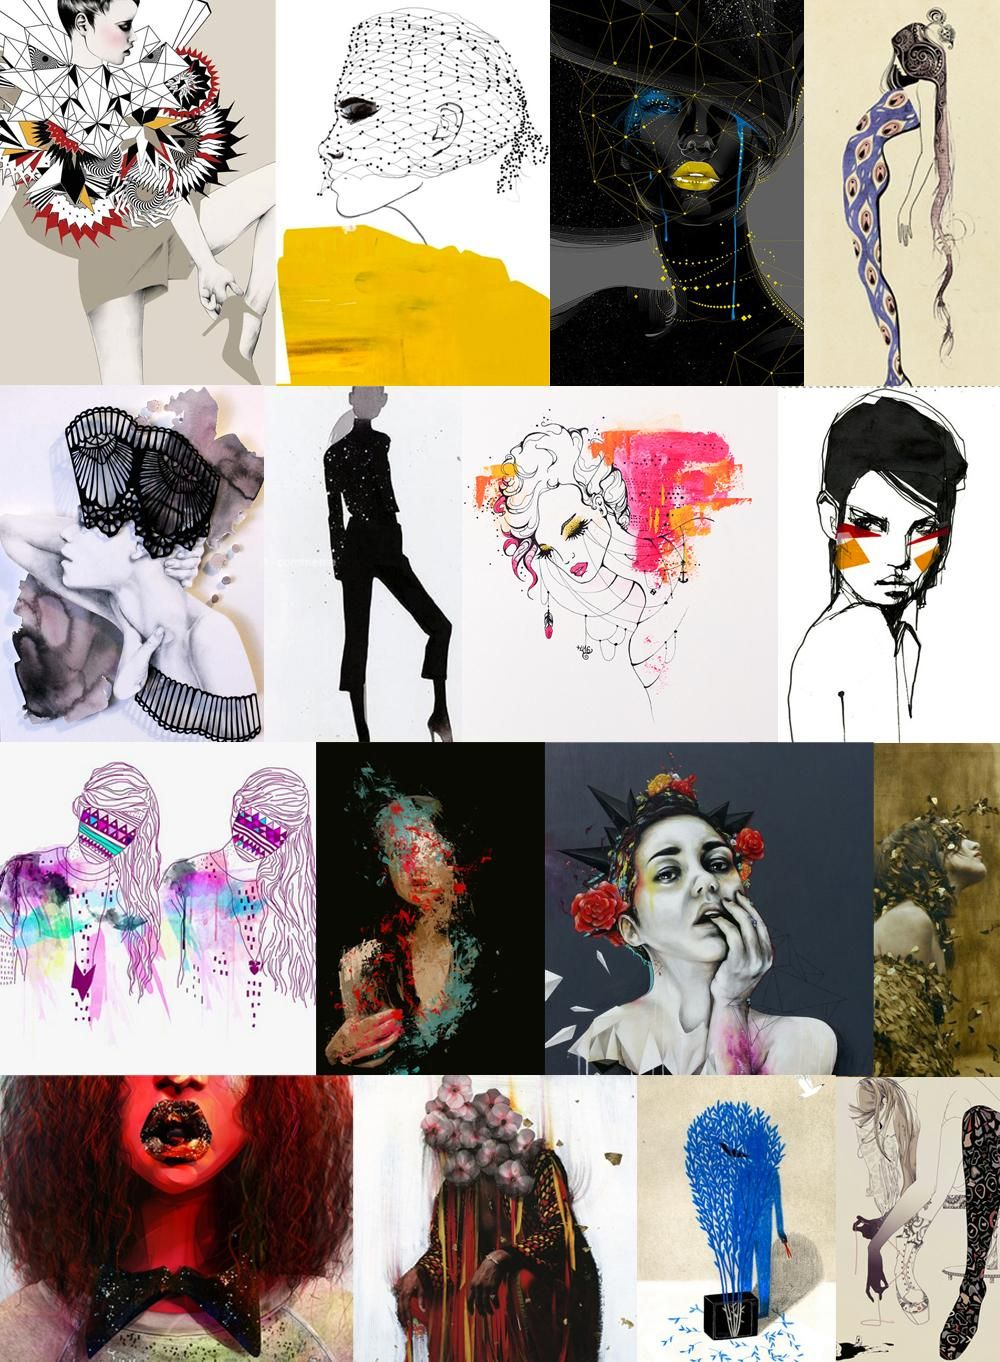 Fashion+Surreal+Colour= - image 1 - student project